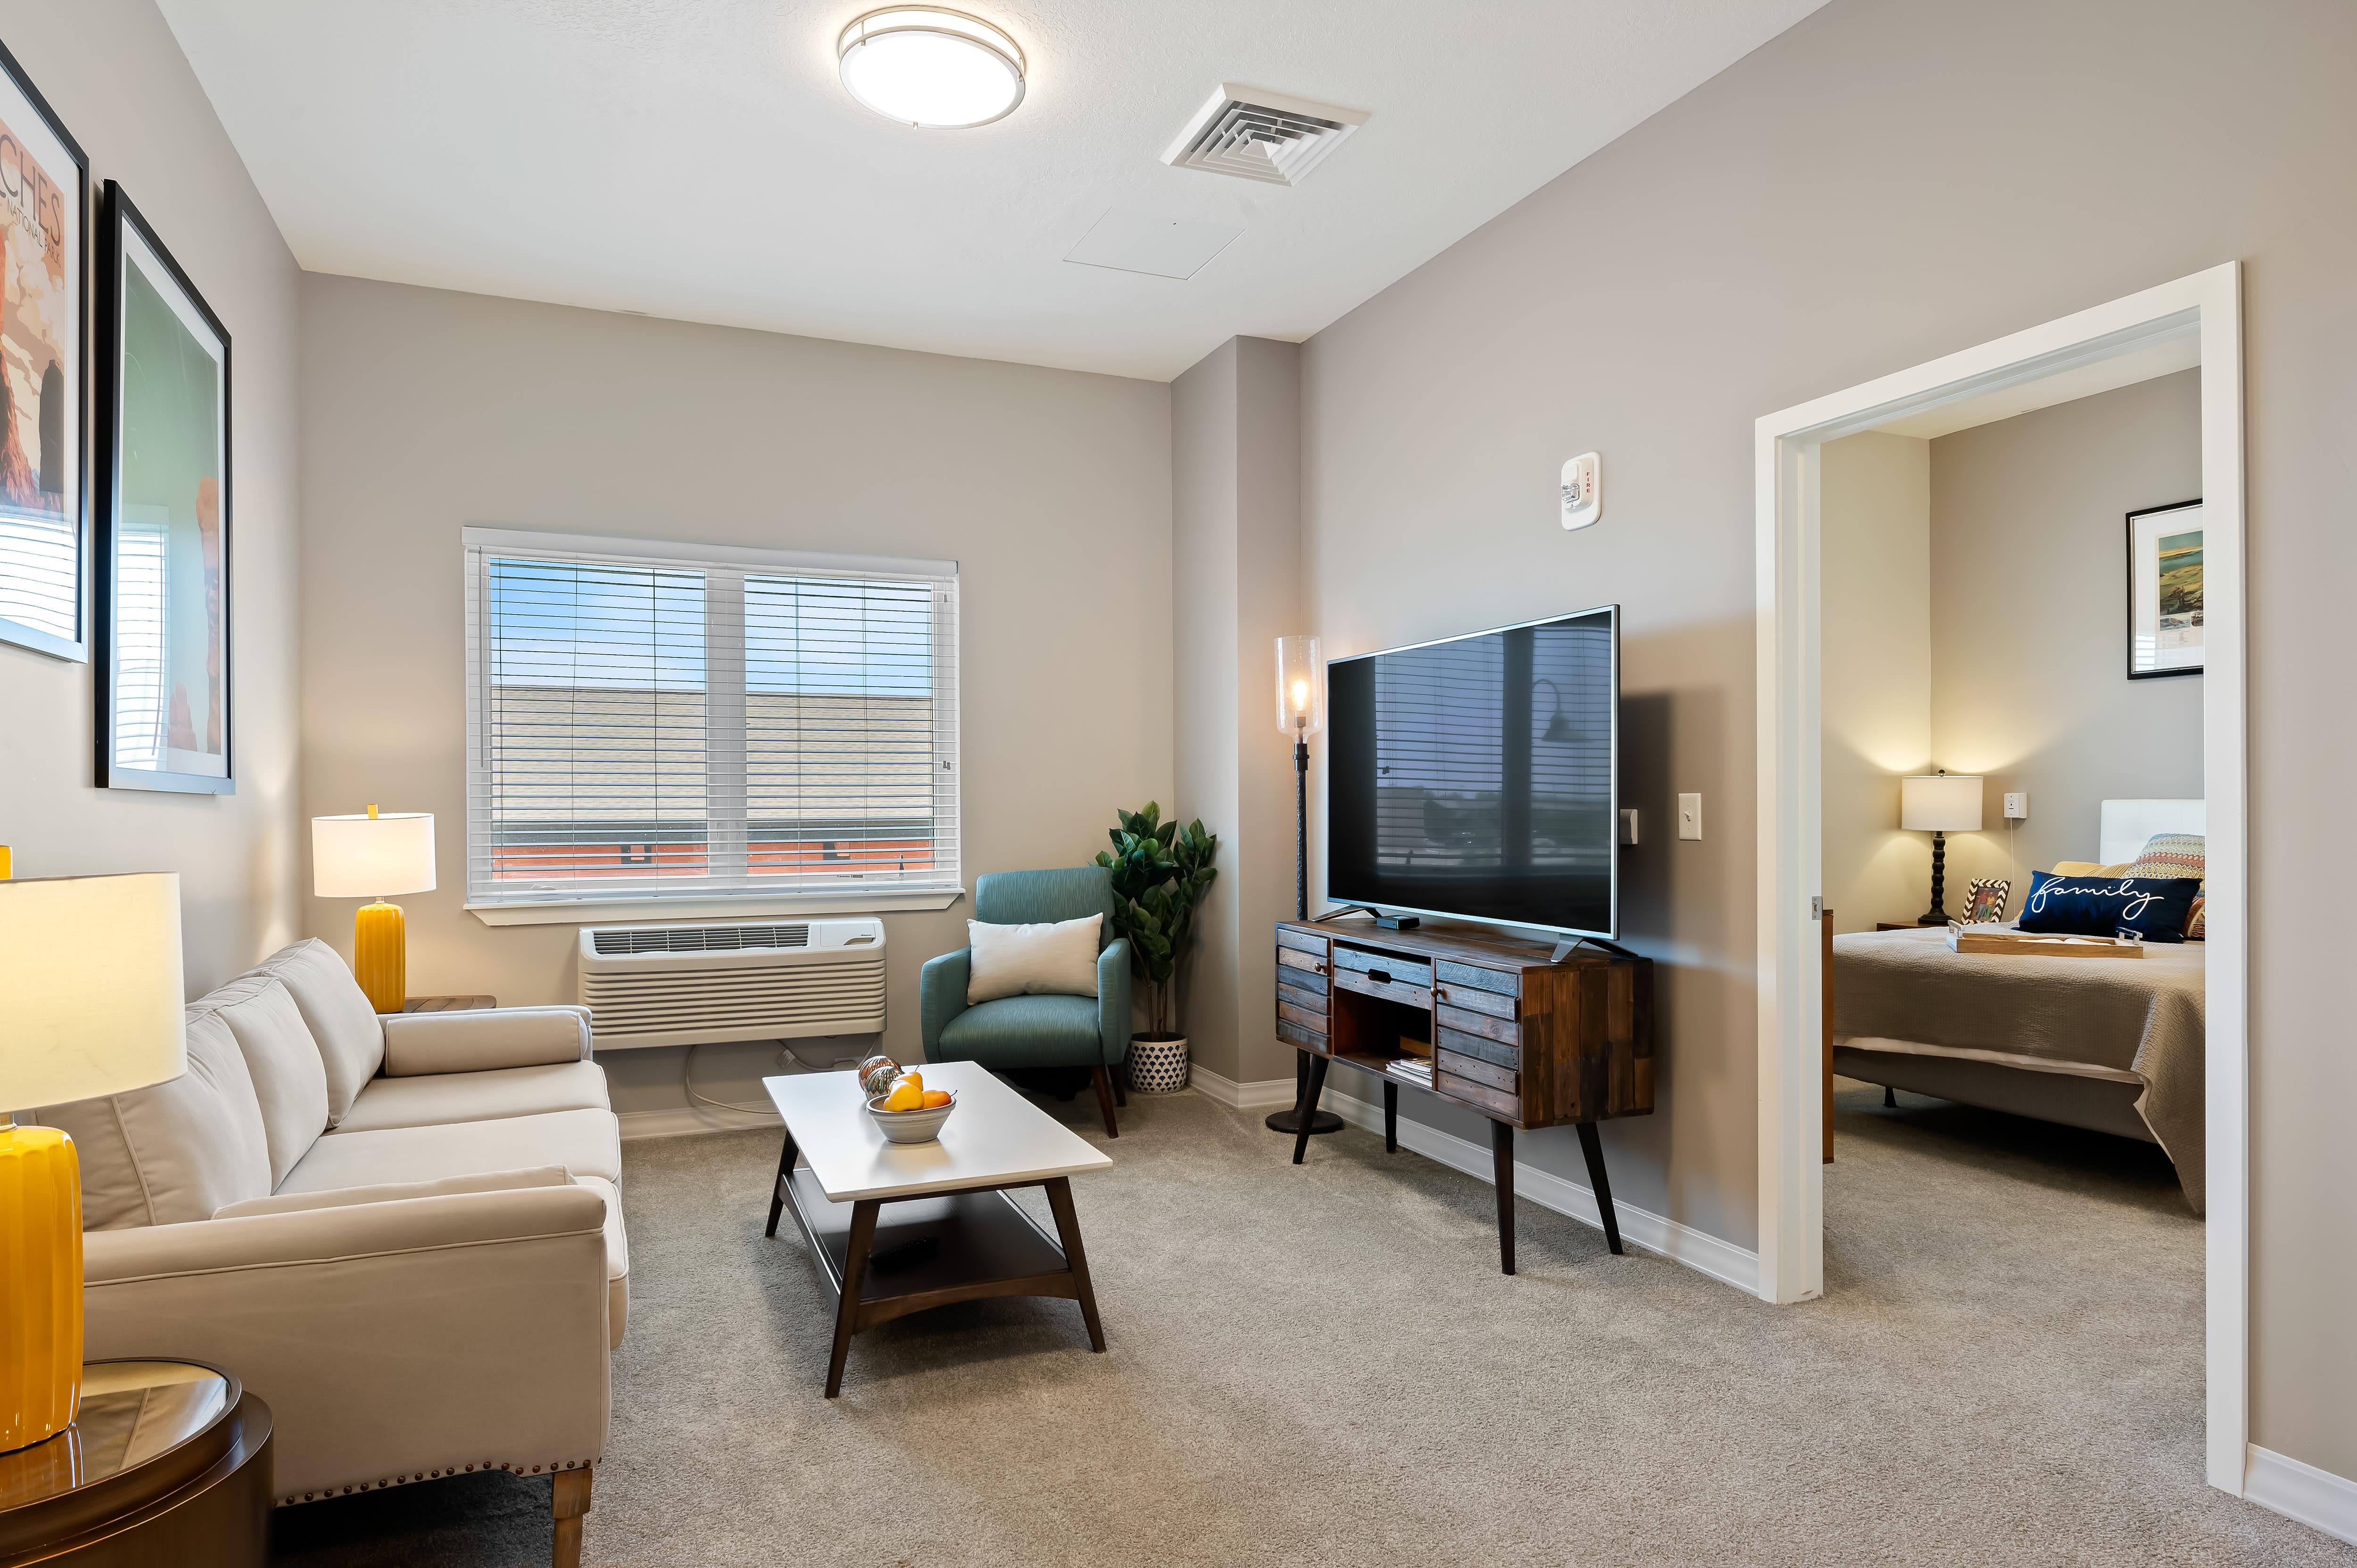 A resident living room at Anthology of South Jordan in South Jordan, Utah